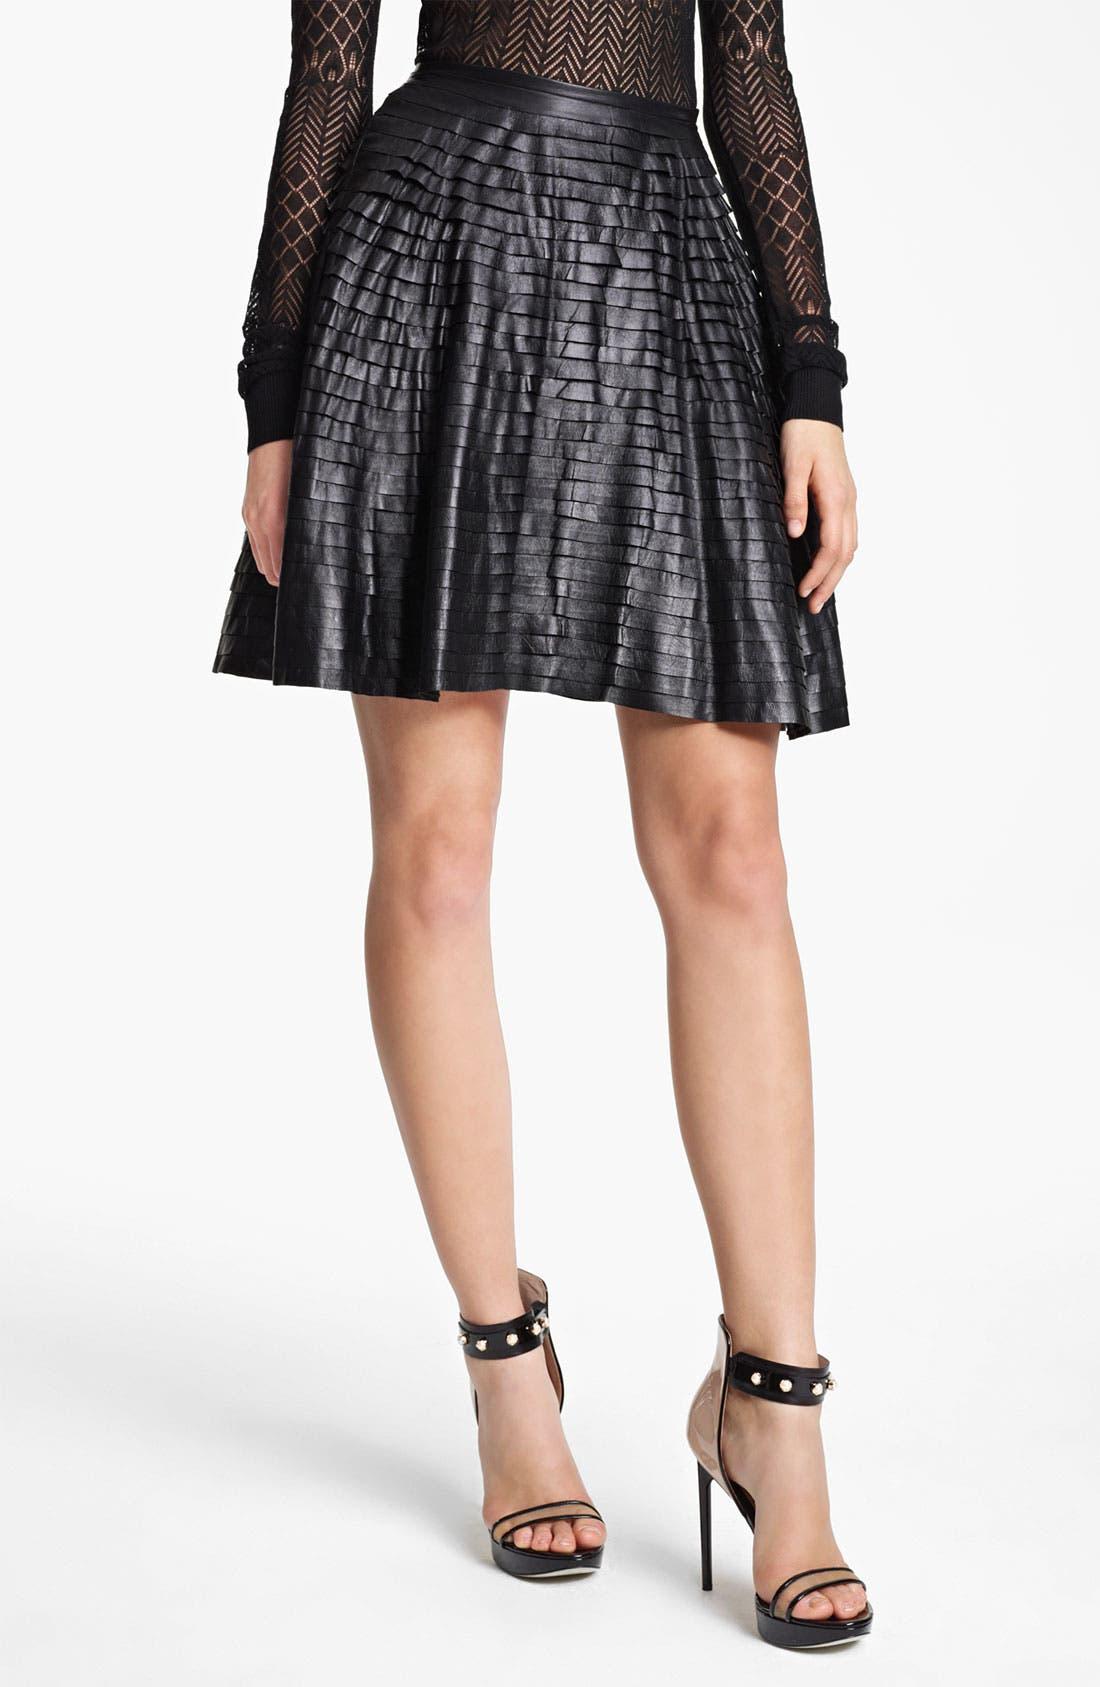 Alternate Image 1 Selected - Jason Wu Tiered Leather Skirt